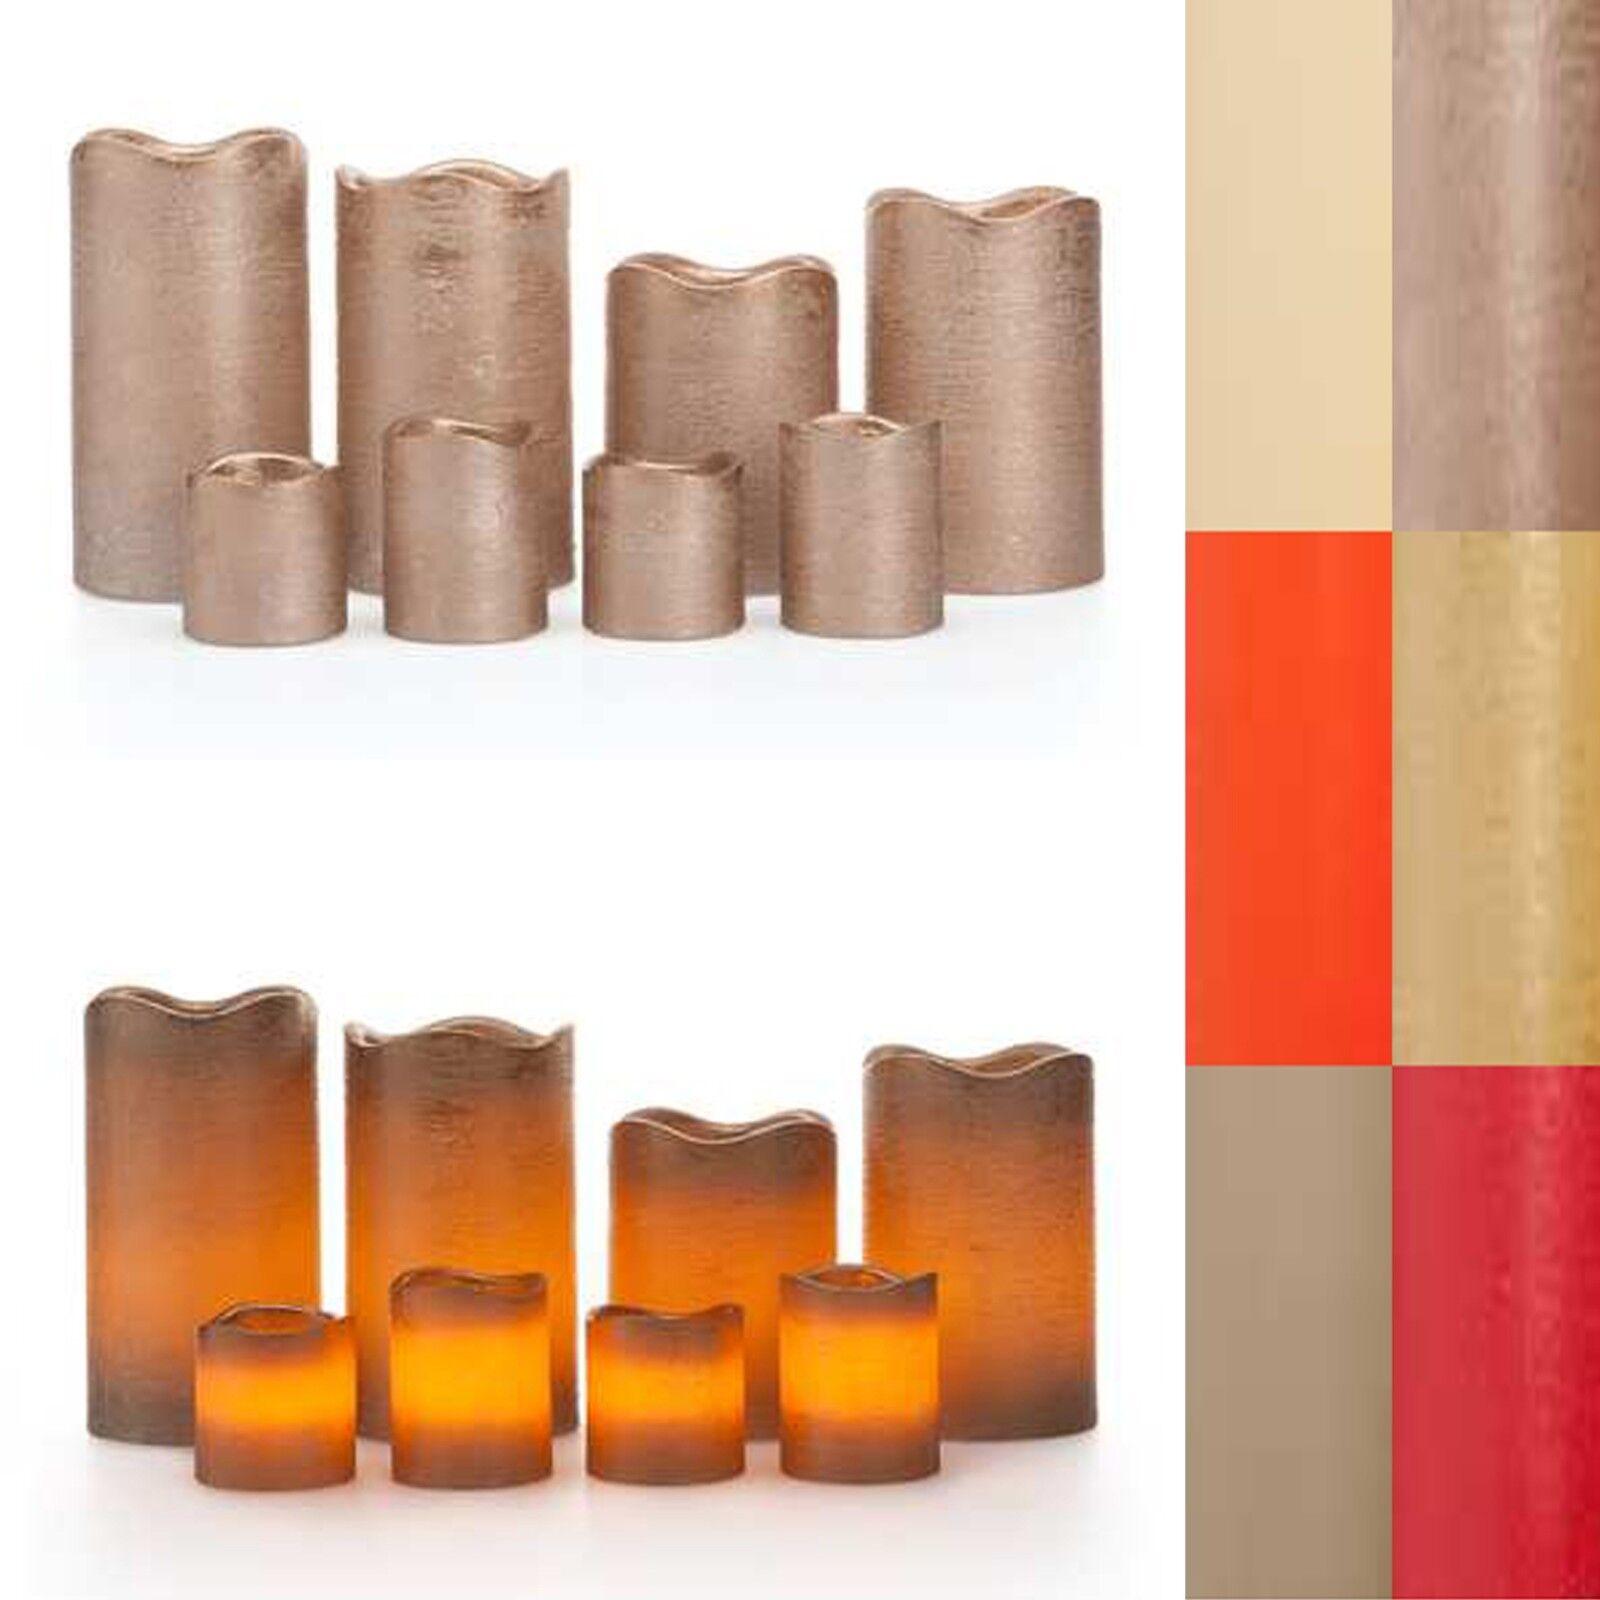 LED Kerzen,8er Set,Timer,4 Stumpenkerzen,4 Votivkerzen,Echtwachskerzen,6 Farben